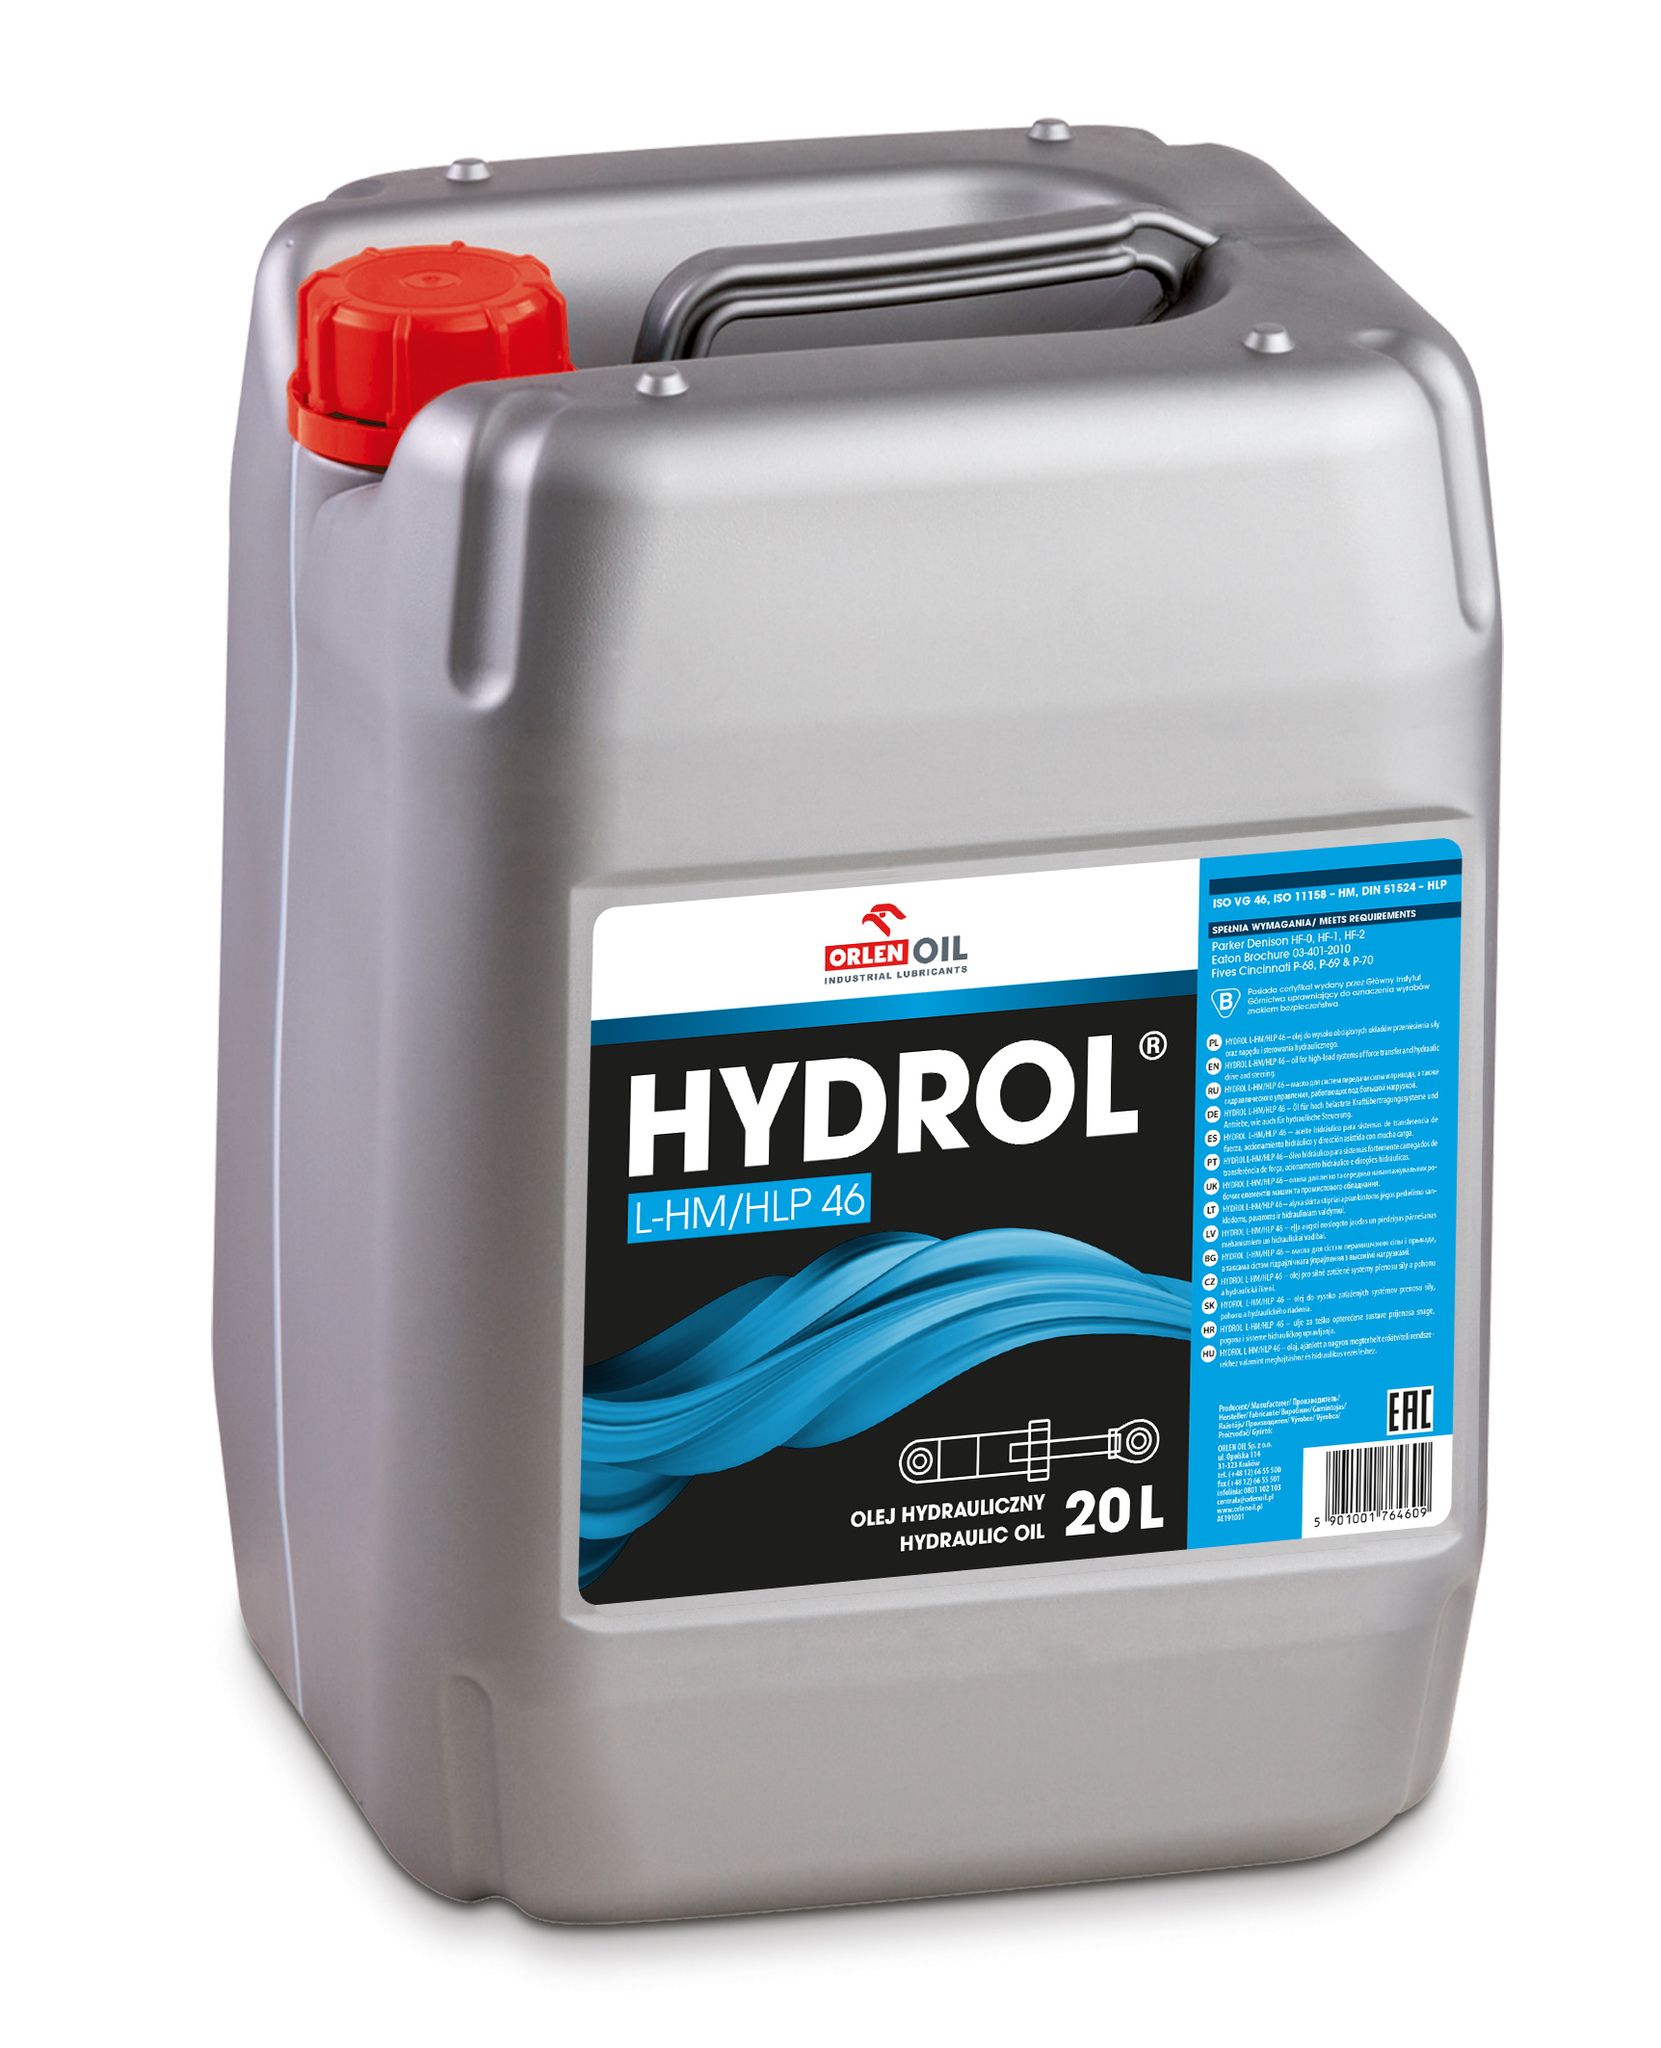 Orlen Oil Hydrol L-HM/HLP 46 Гидравлическое масло